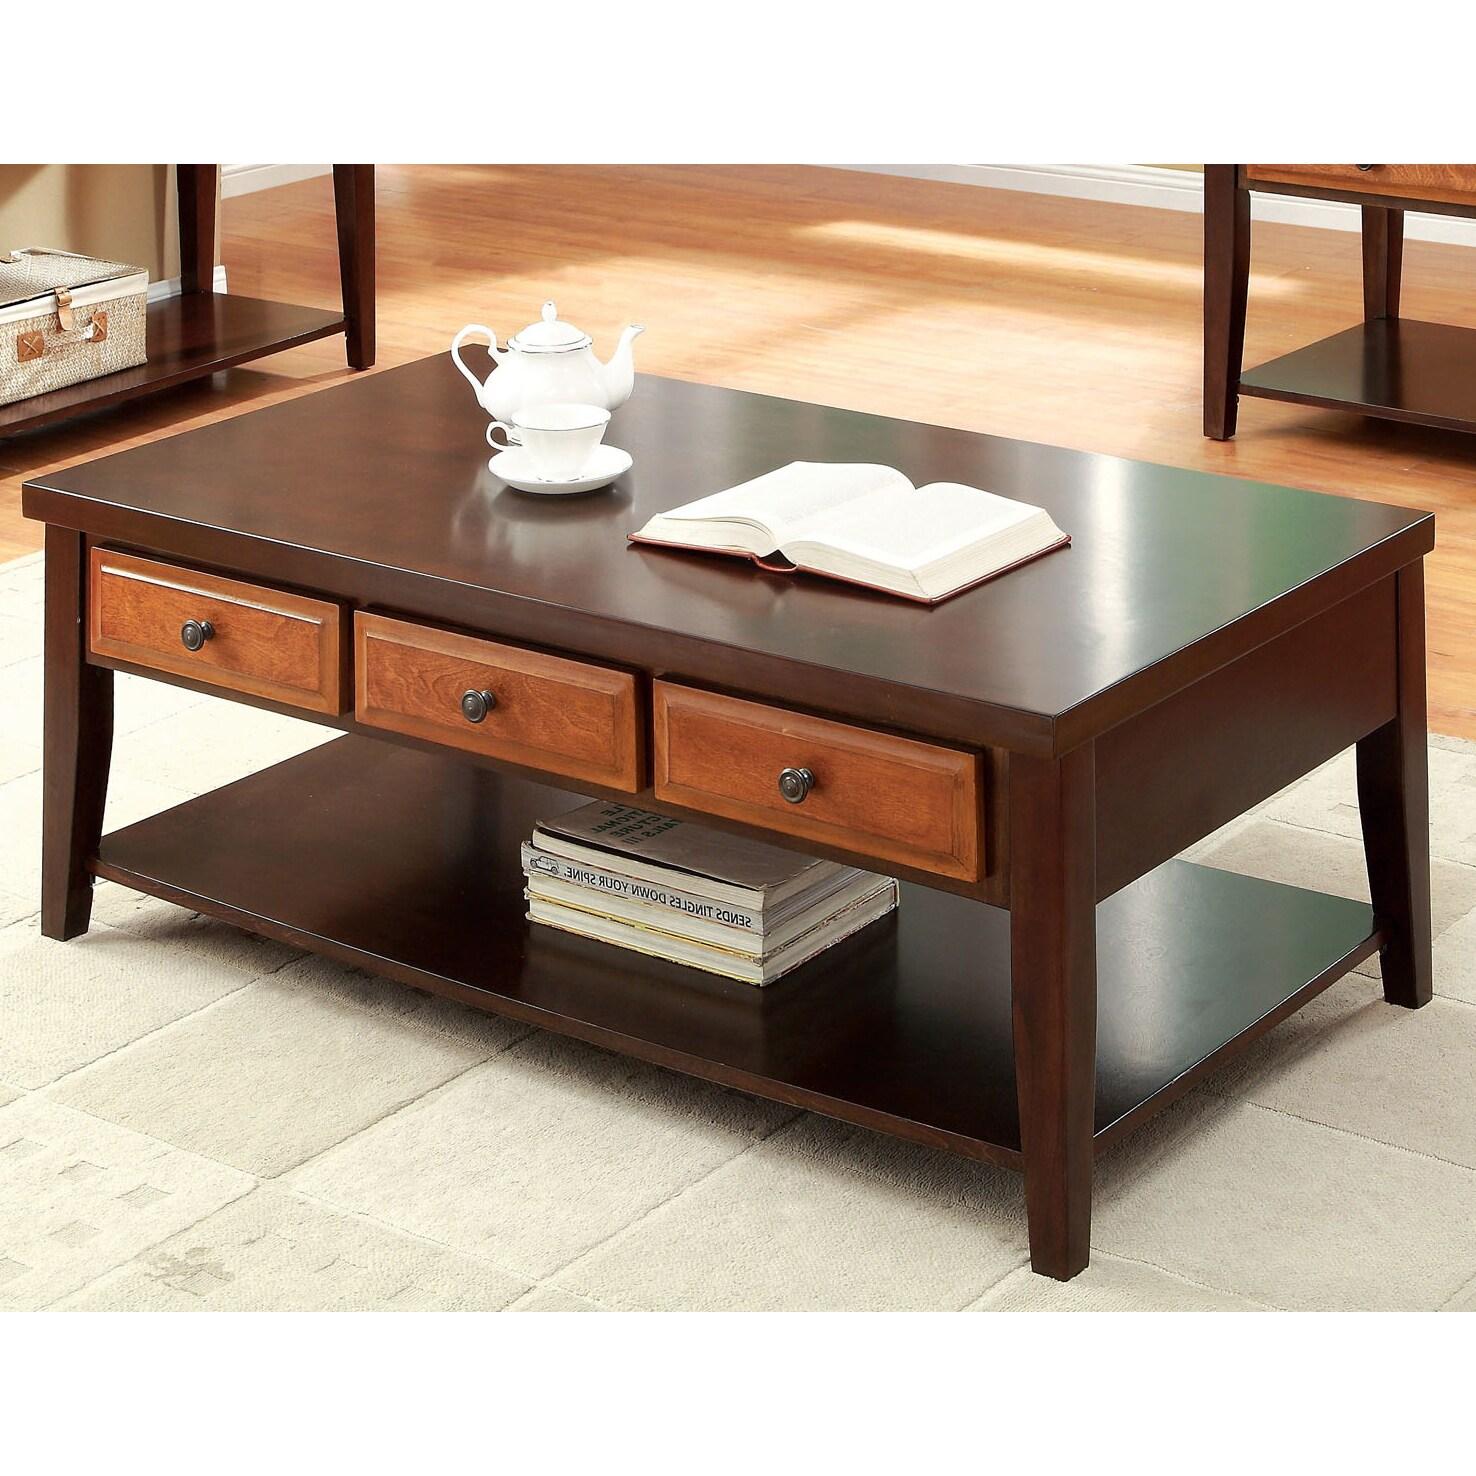 Furniture of America Berthal Two Tone 3 Drawer Coffee Table Free